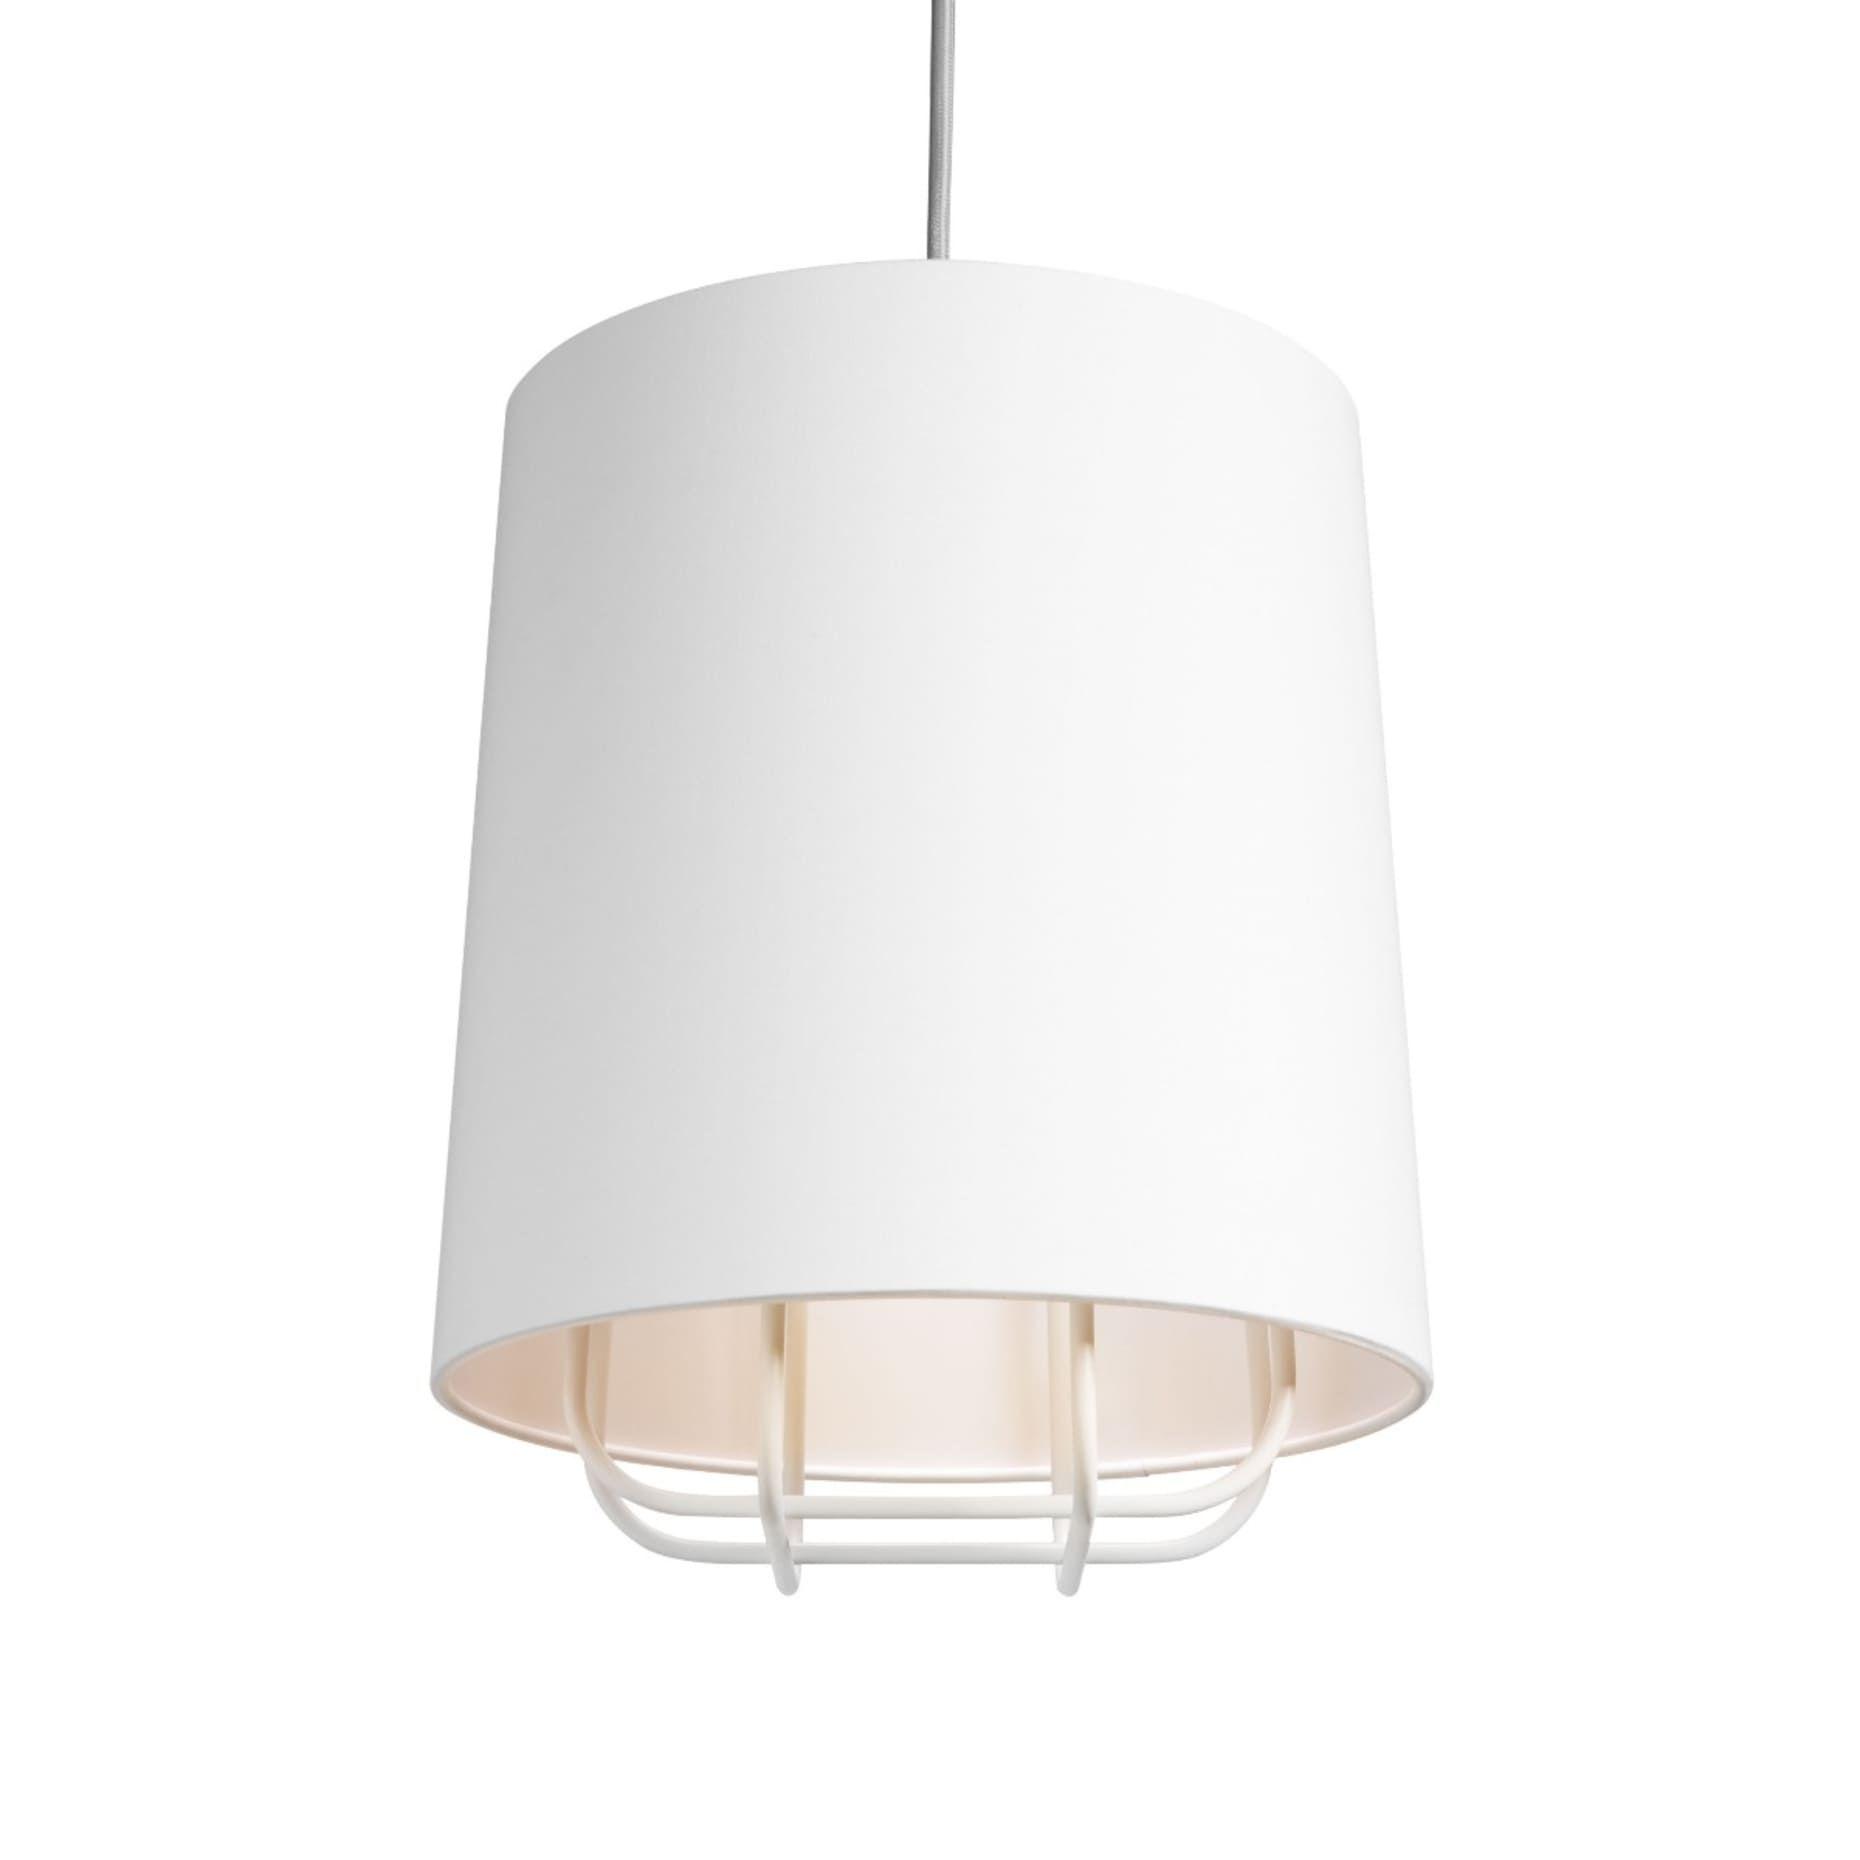 Perimeter Small Pendant Light Small Pendant Lights Pendant Light Small Pendant